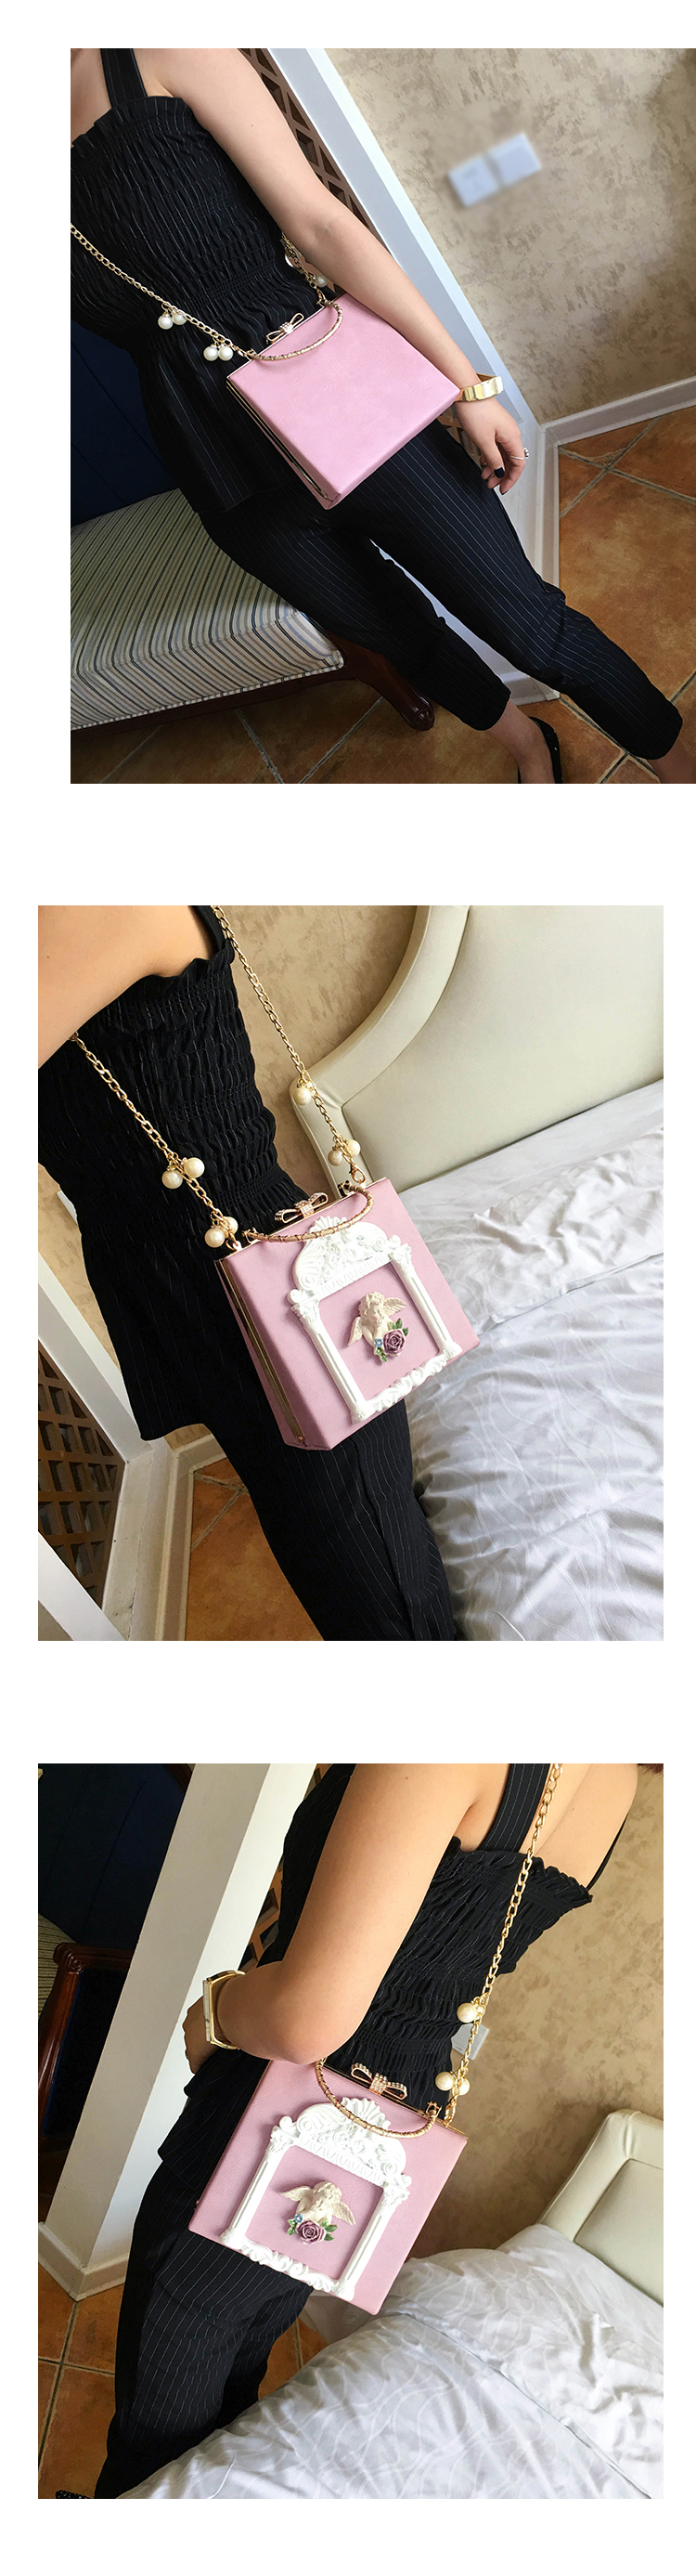 2018 NEW Rose 3D Palace Sculpture Frame Bag Luxury Handbags Women Party Bags Designer Lady Cute Shoulder Messenger Bag Sac Tote 25